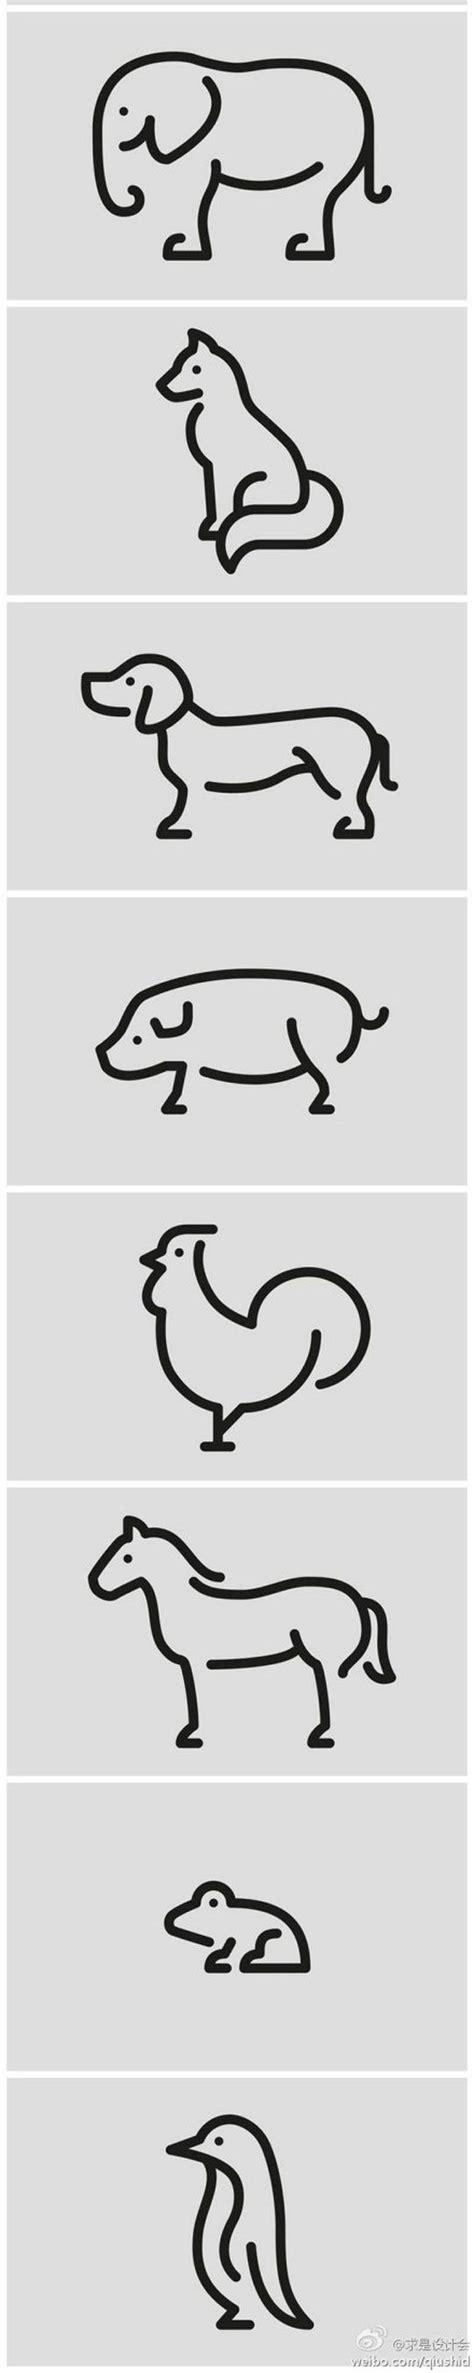 ideas  simple drawings  pinterest simple